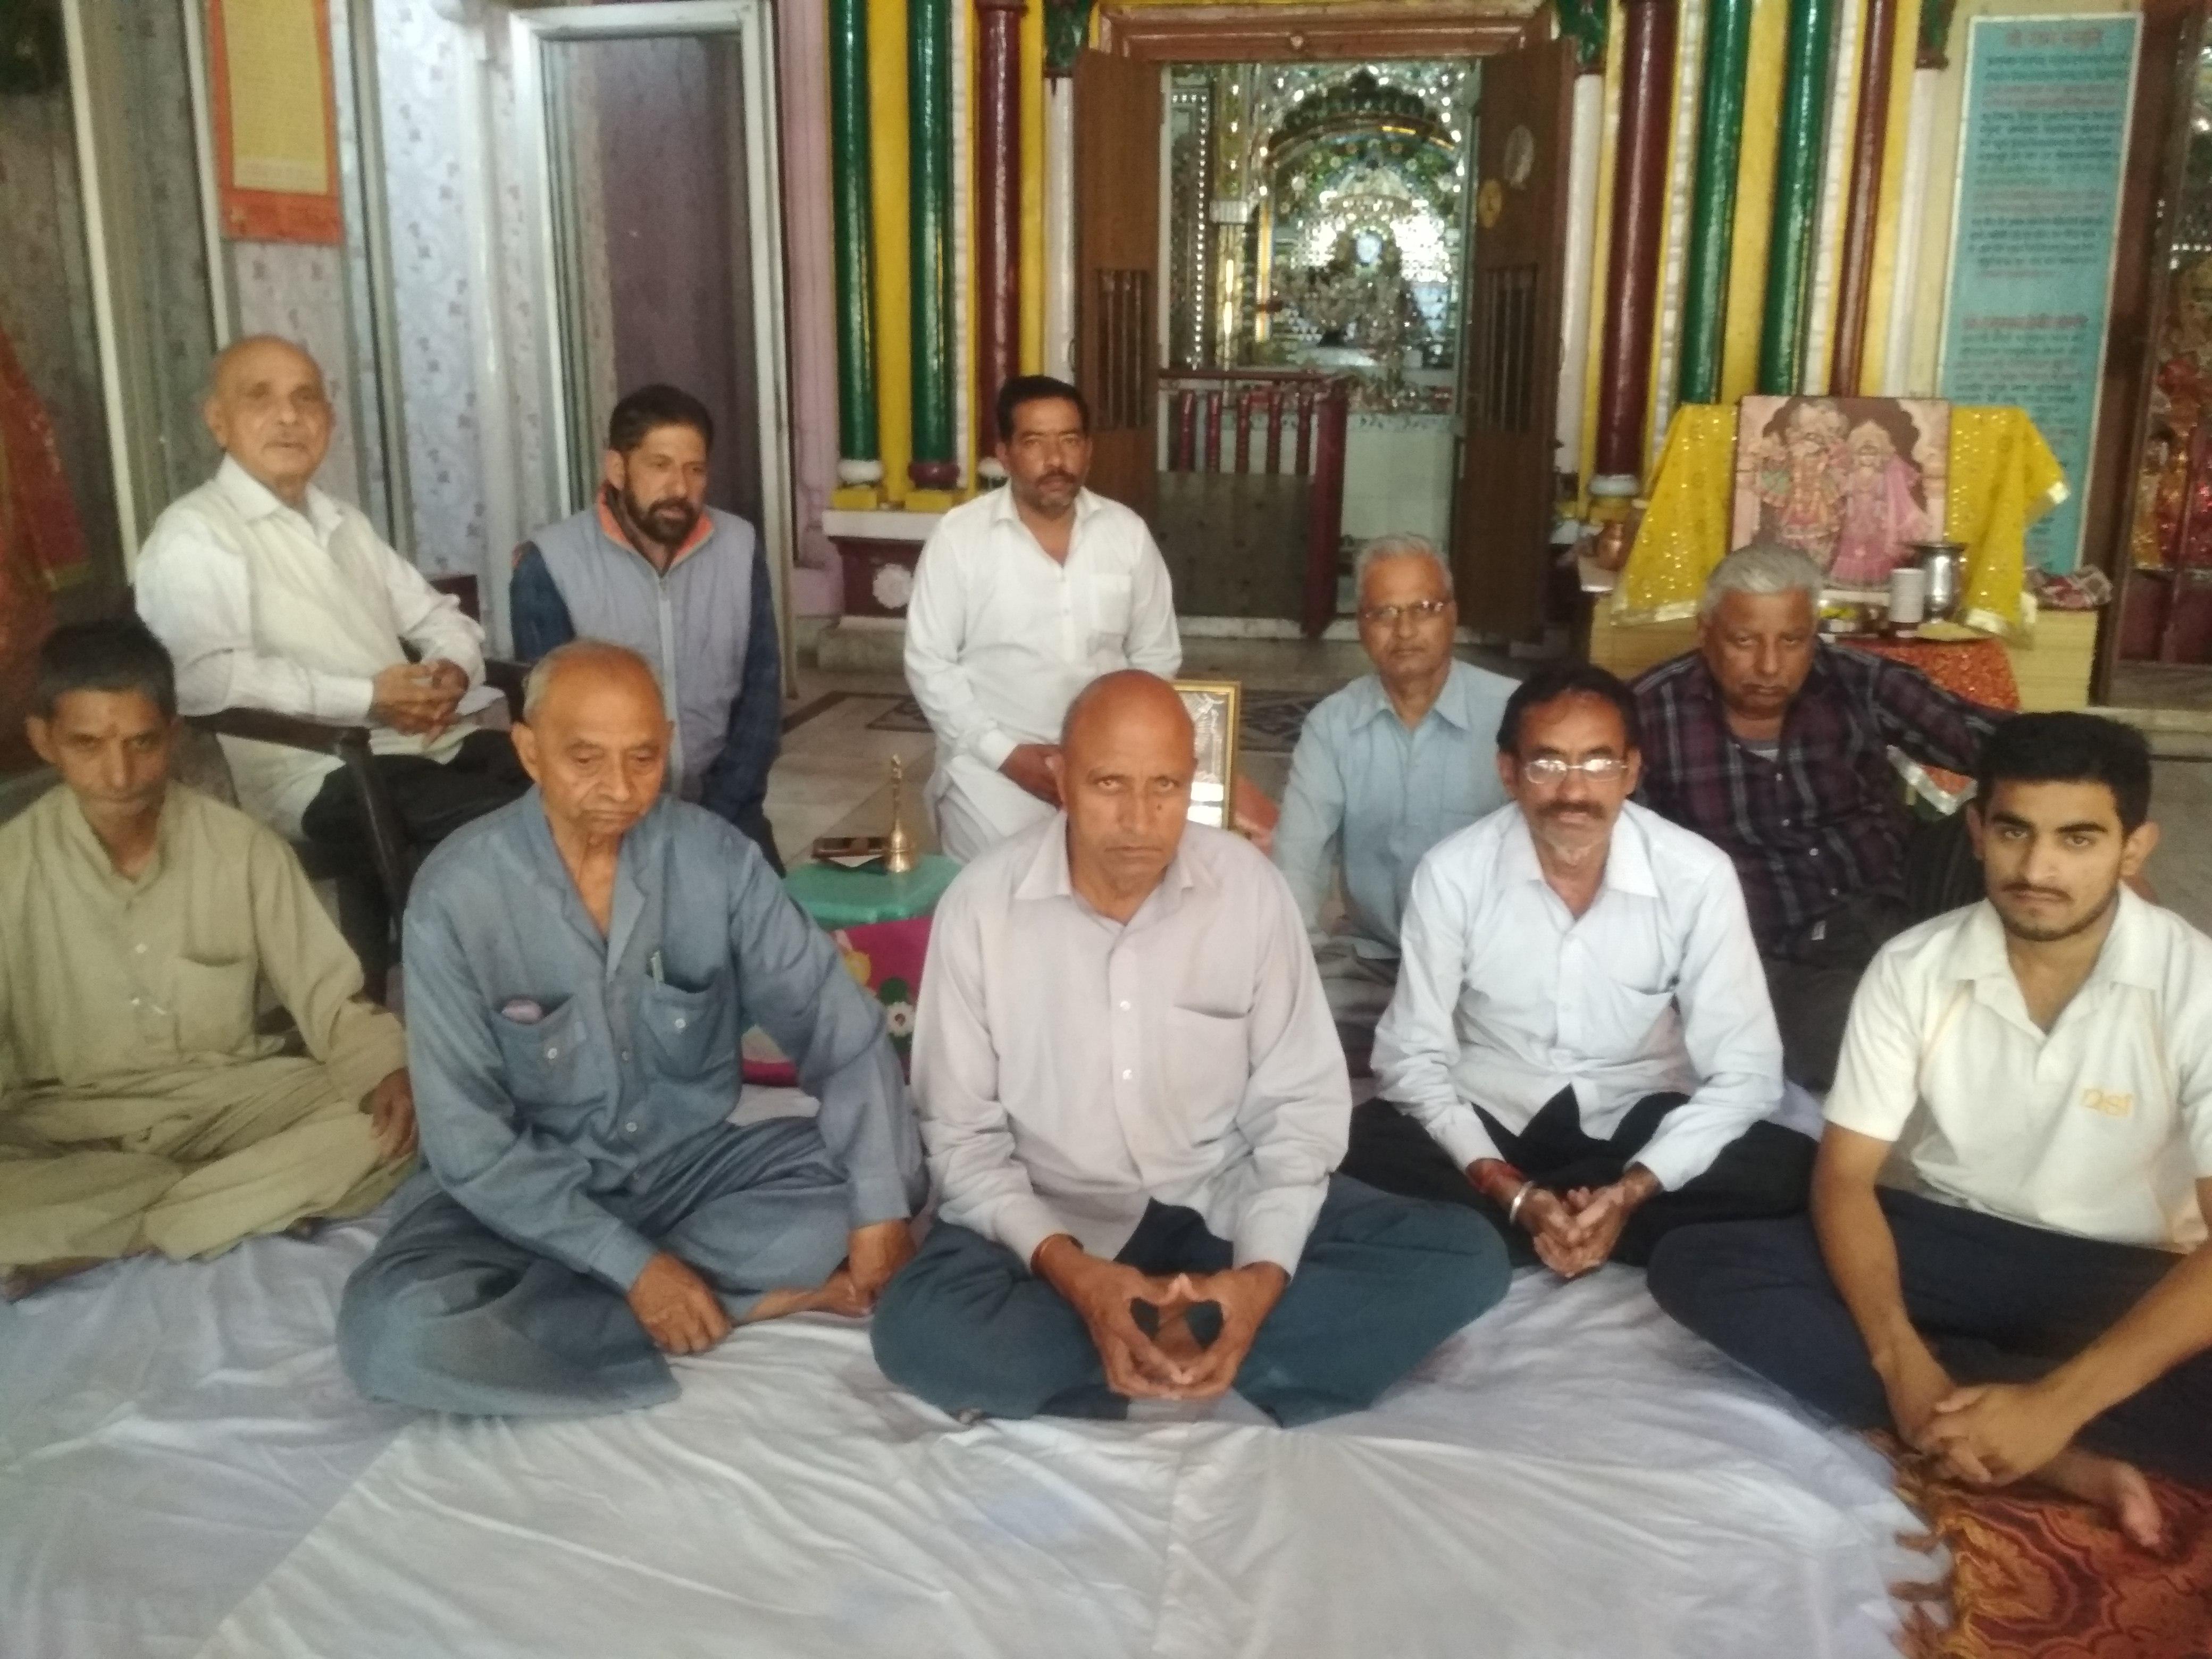 Parashuram Jayanti will be celebrated on April 18 by Haryana Brahmin Parisangh